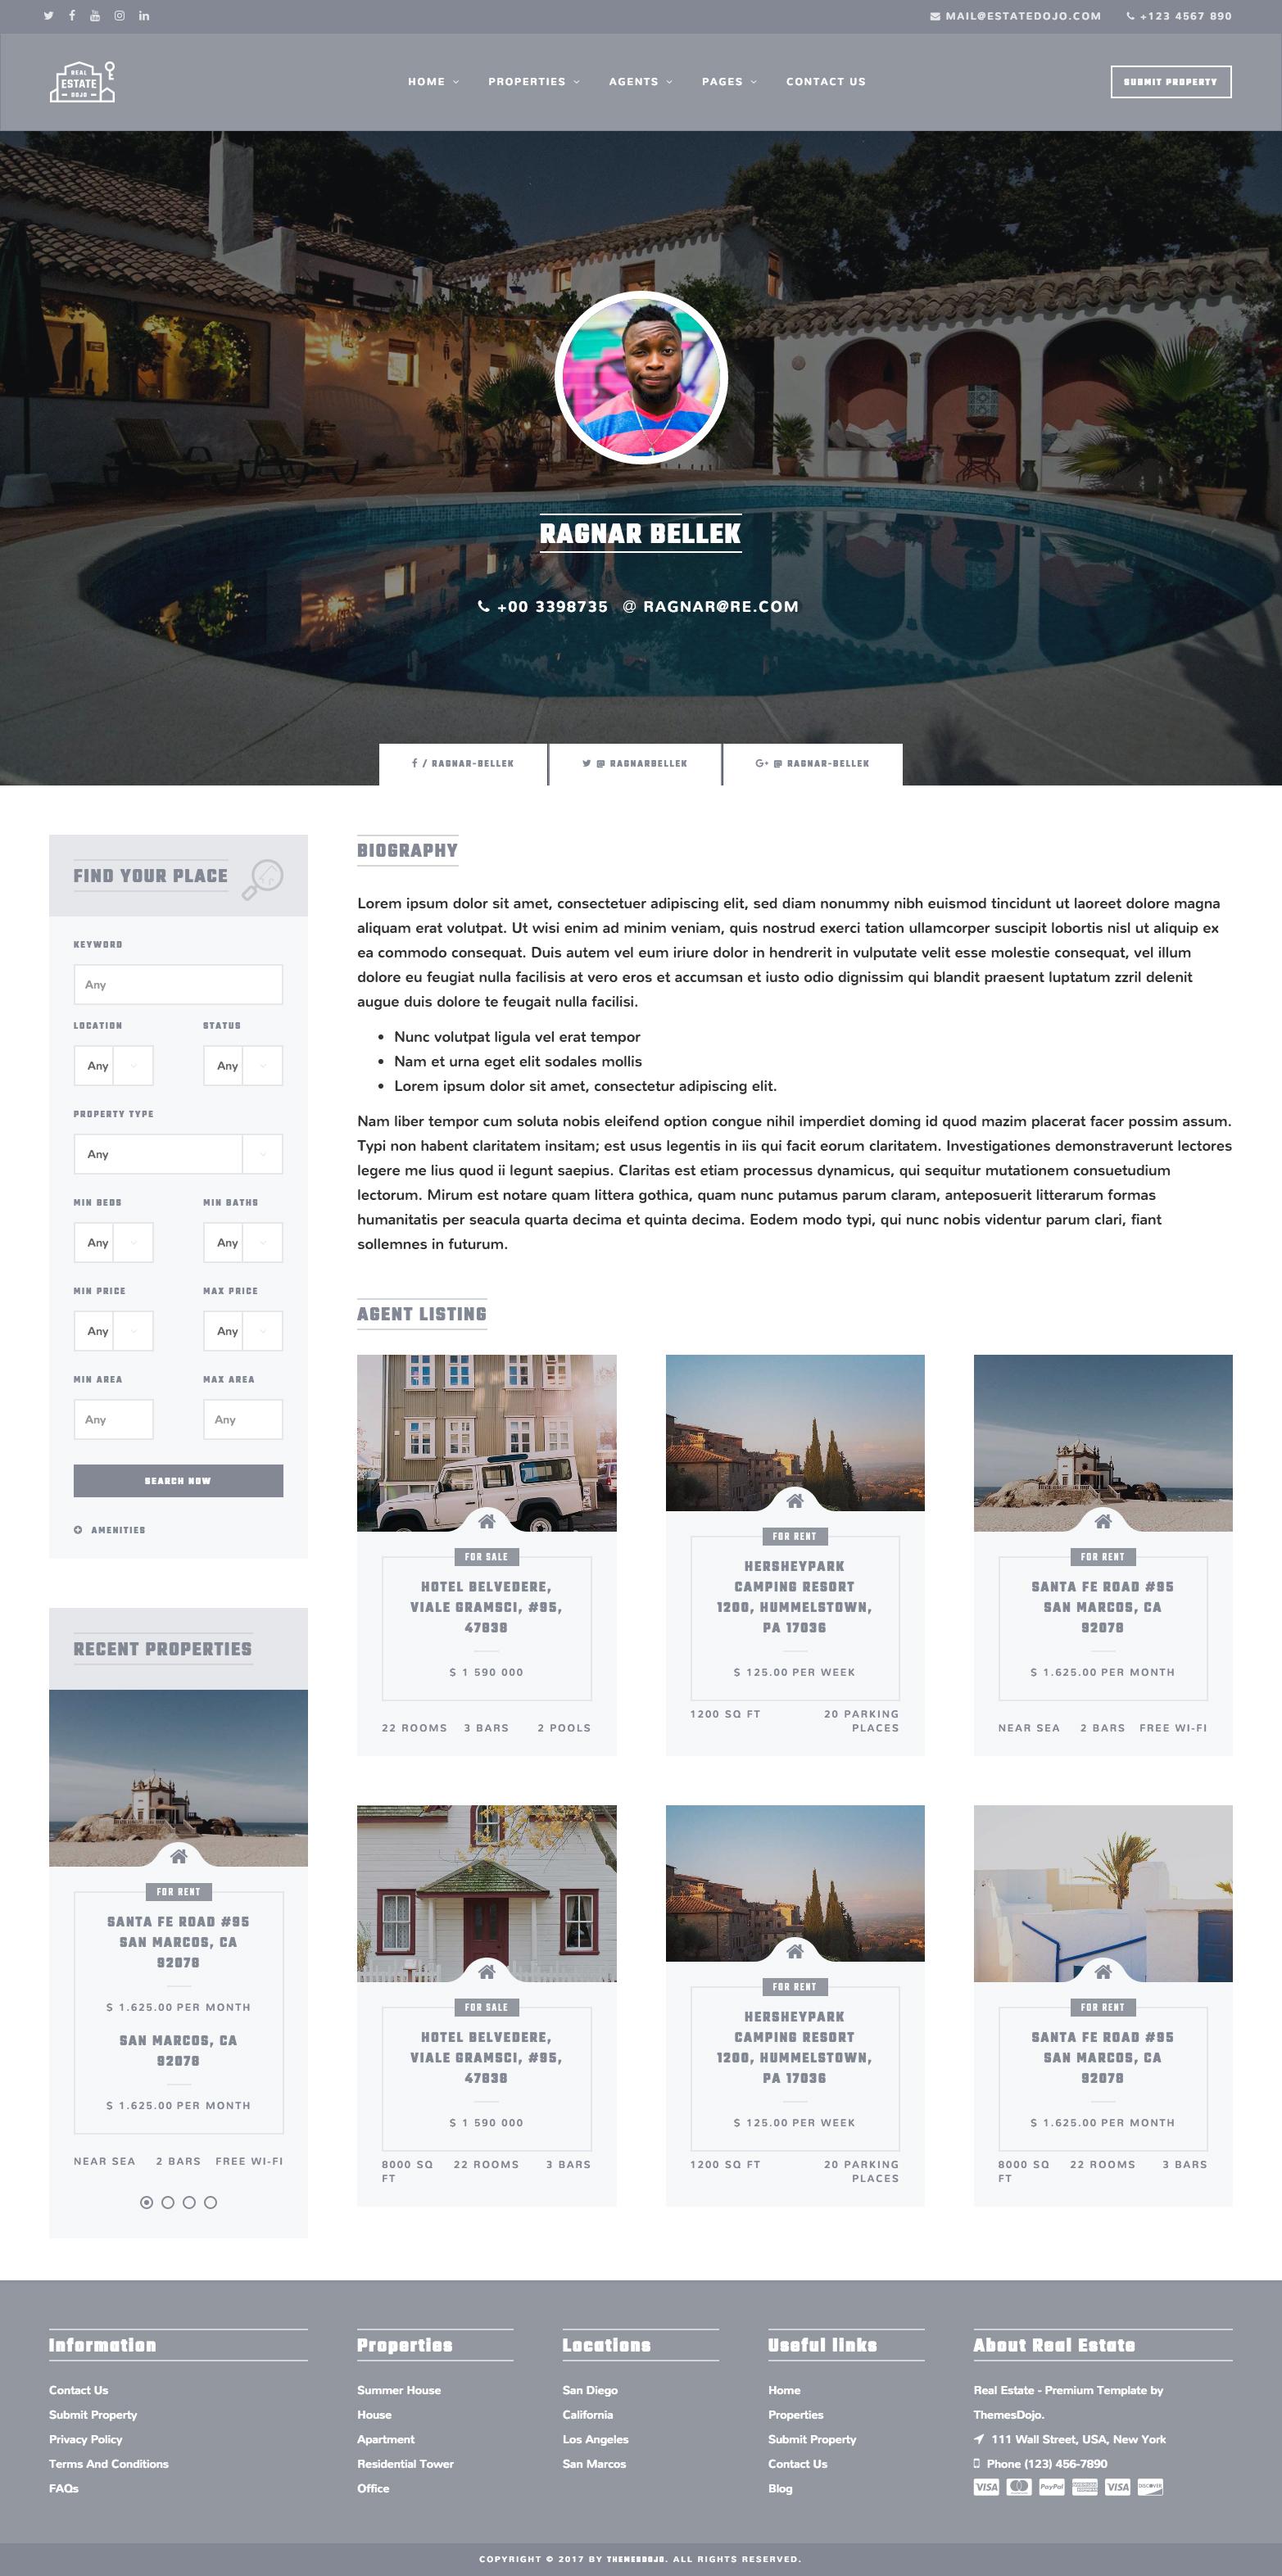 real-estate-dojo-agent-page-list.jpg